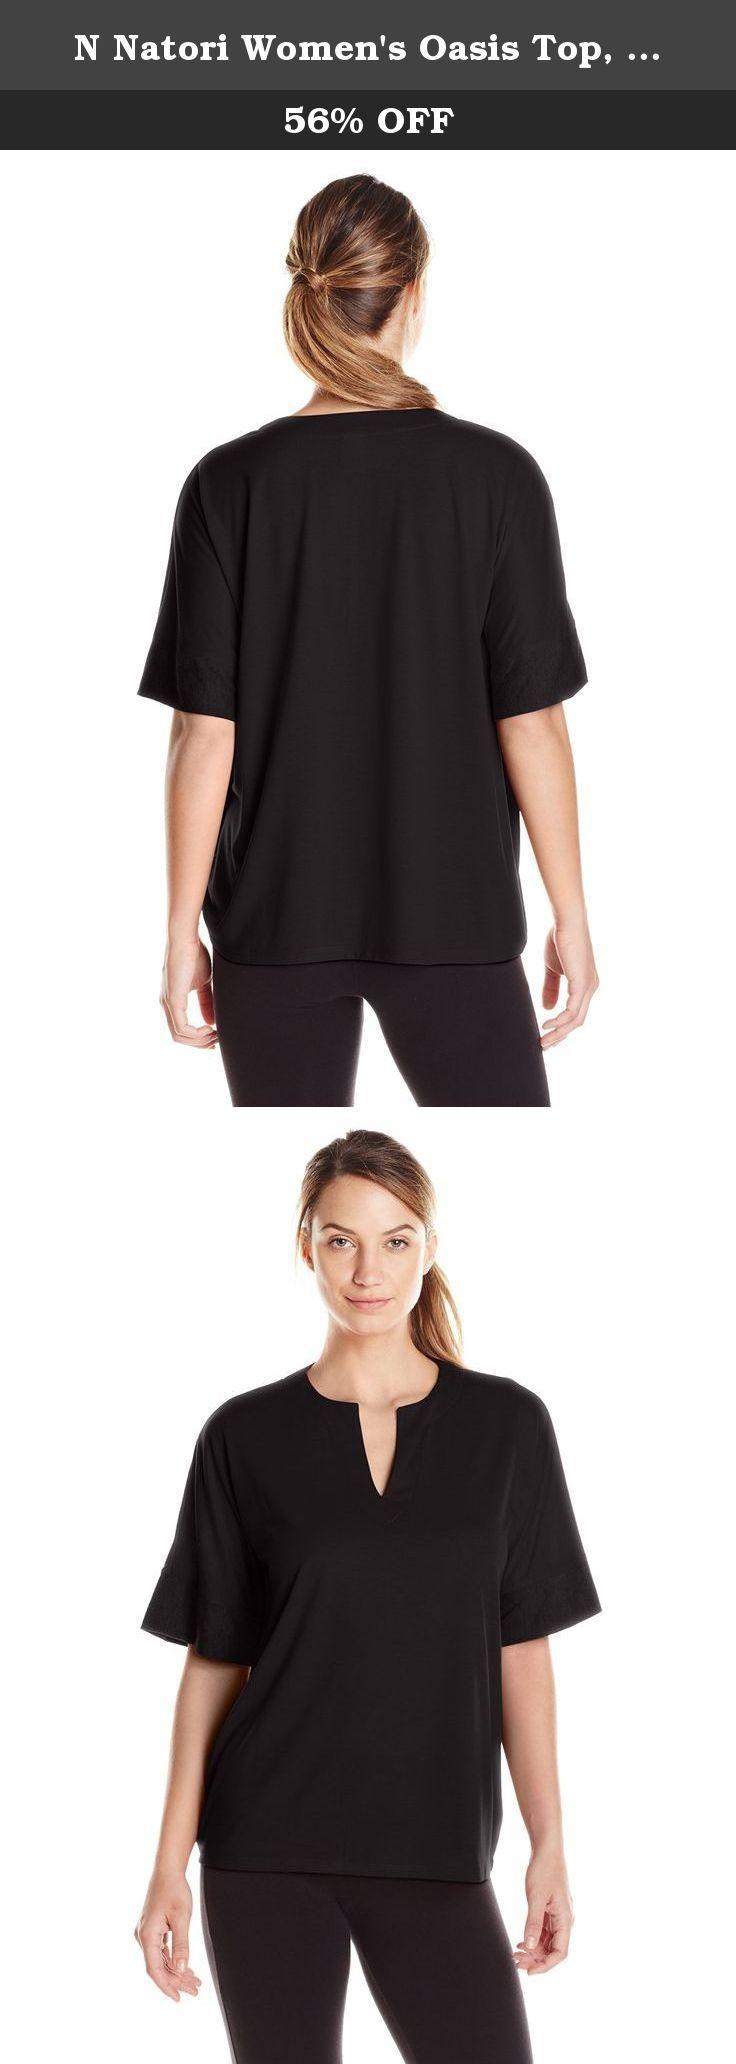 N Natori Women's Oasis Top, Black, Medium. Solid knit top.